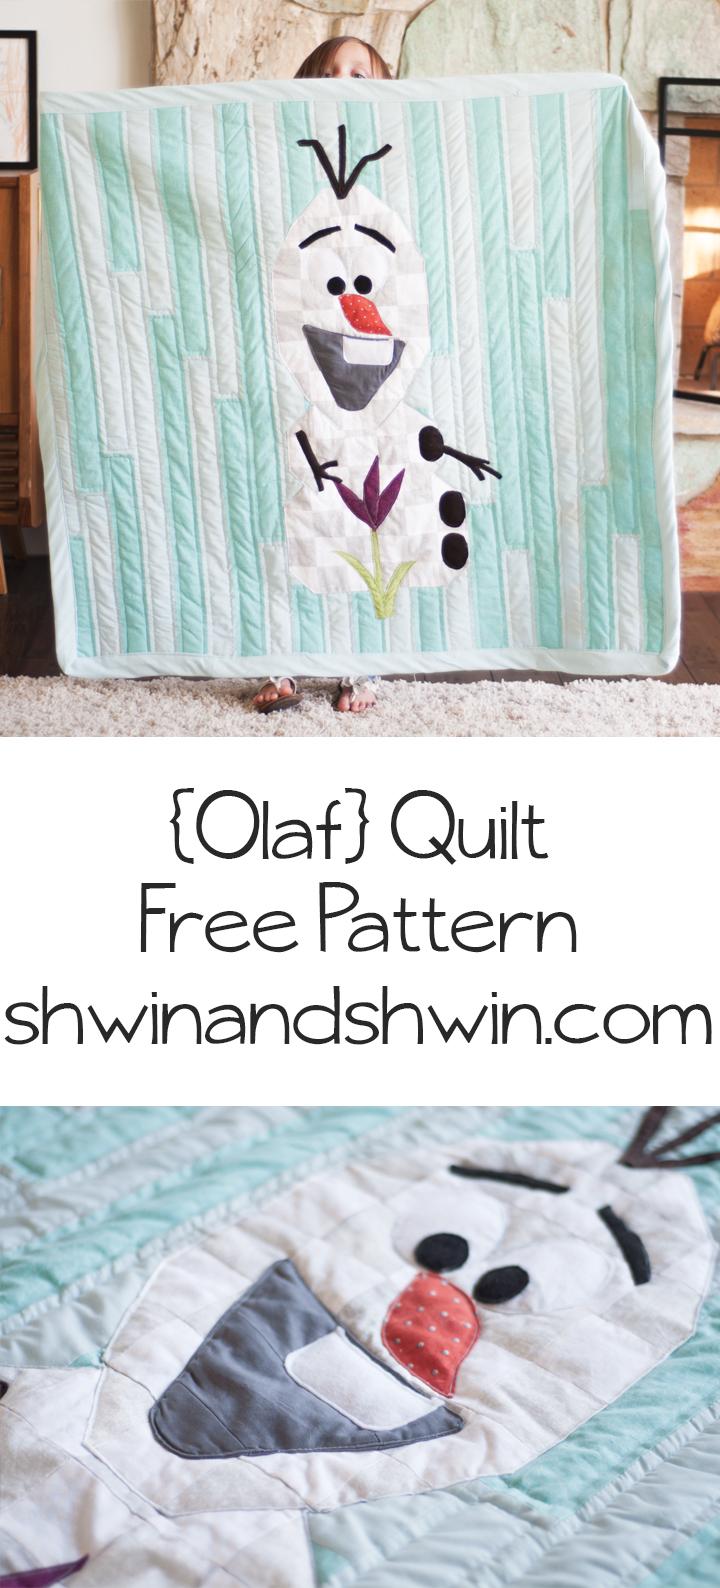 Cute Olaf Frozen Quilt Free Pattern and Tutorial Shwin uShwin